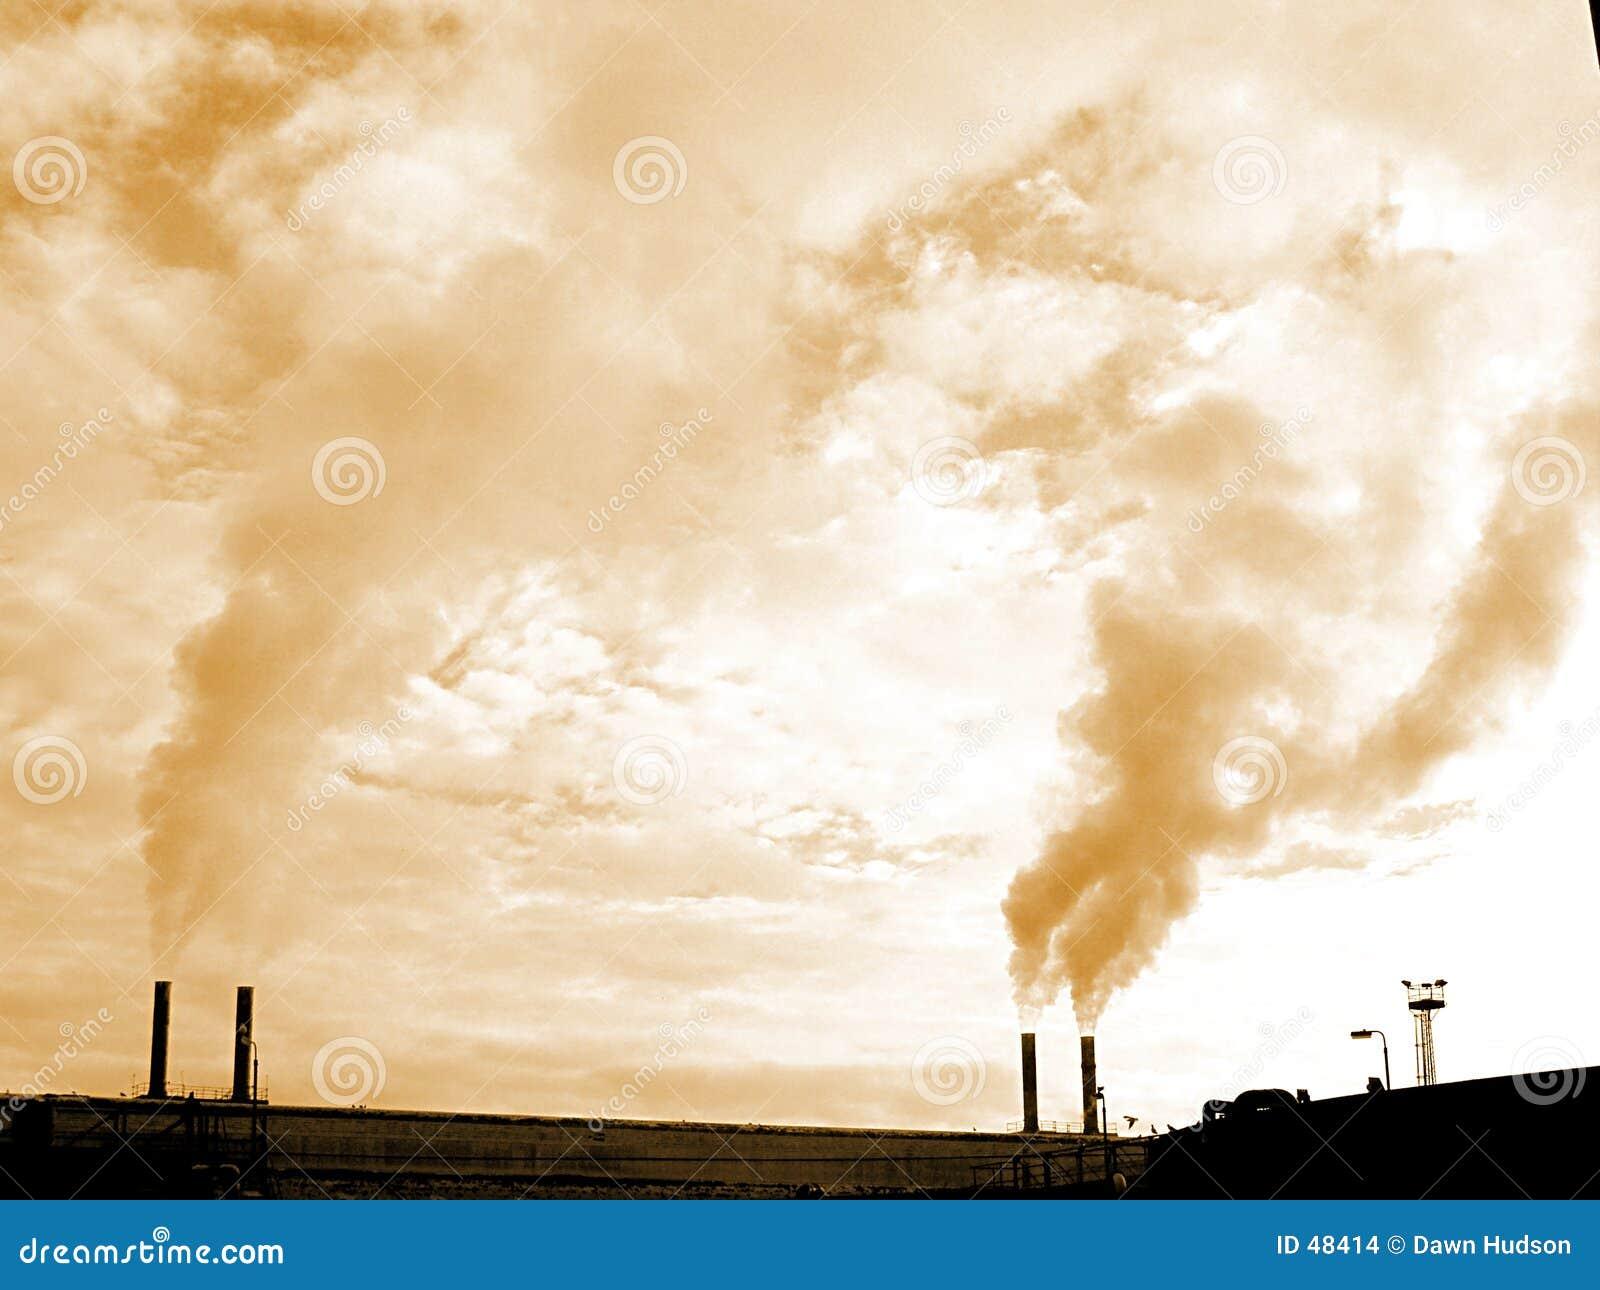 Industrielle Kamine